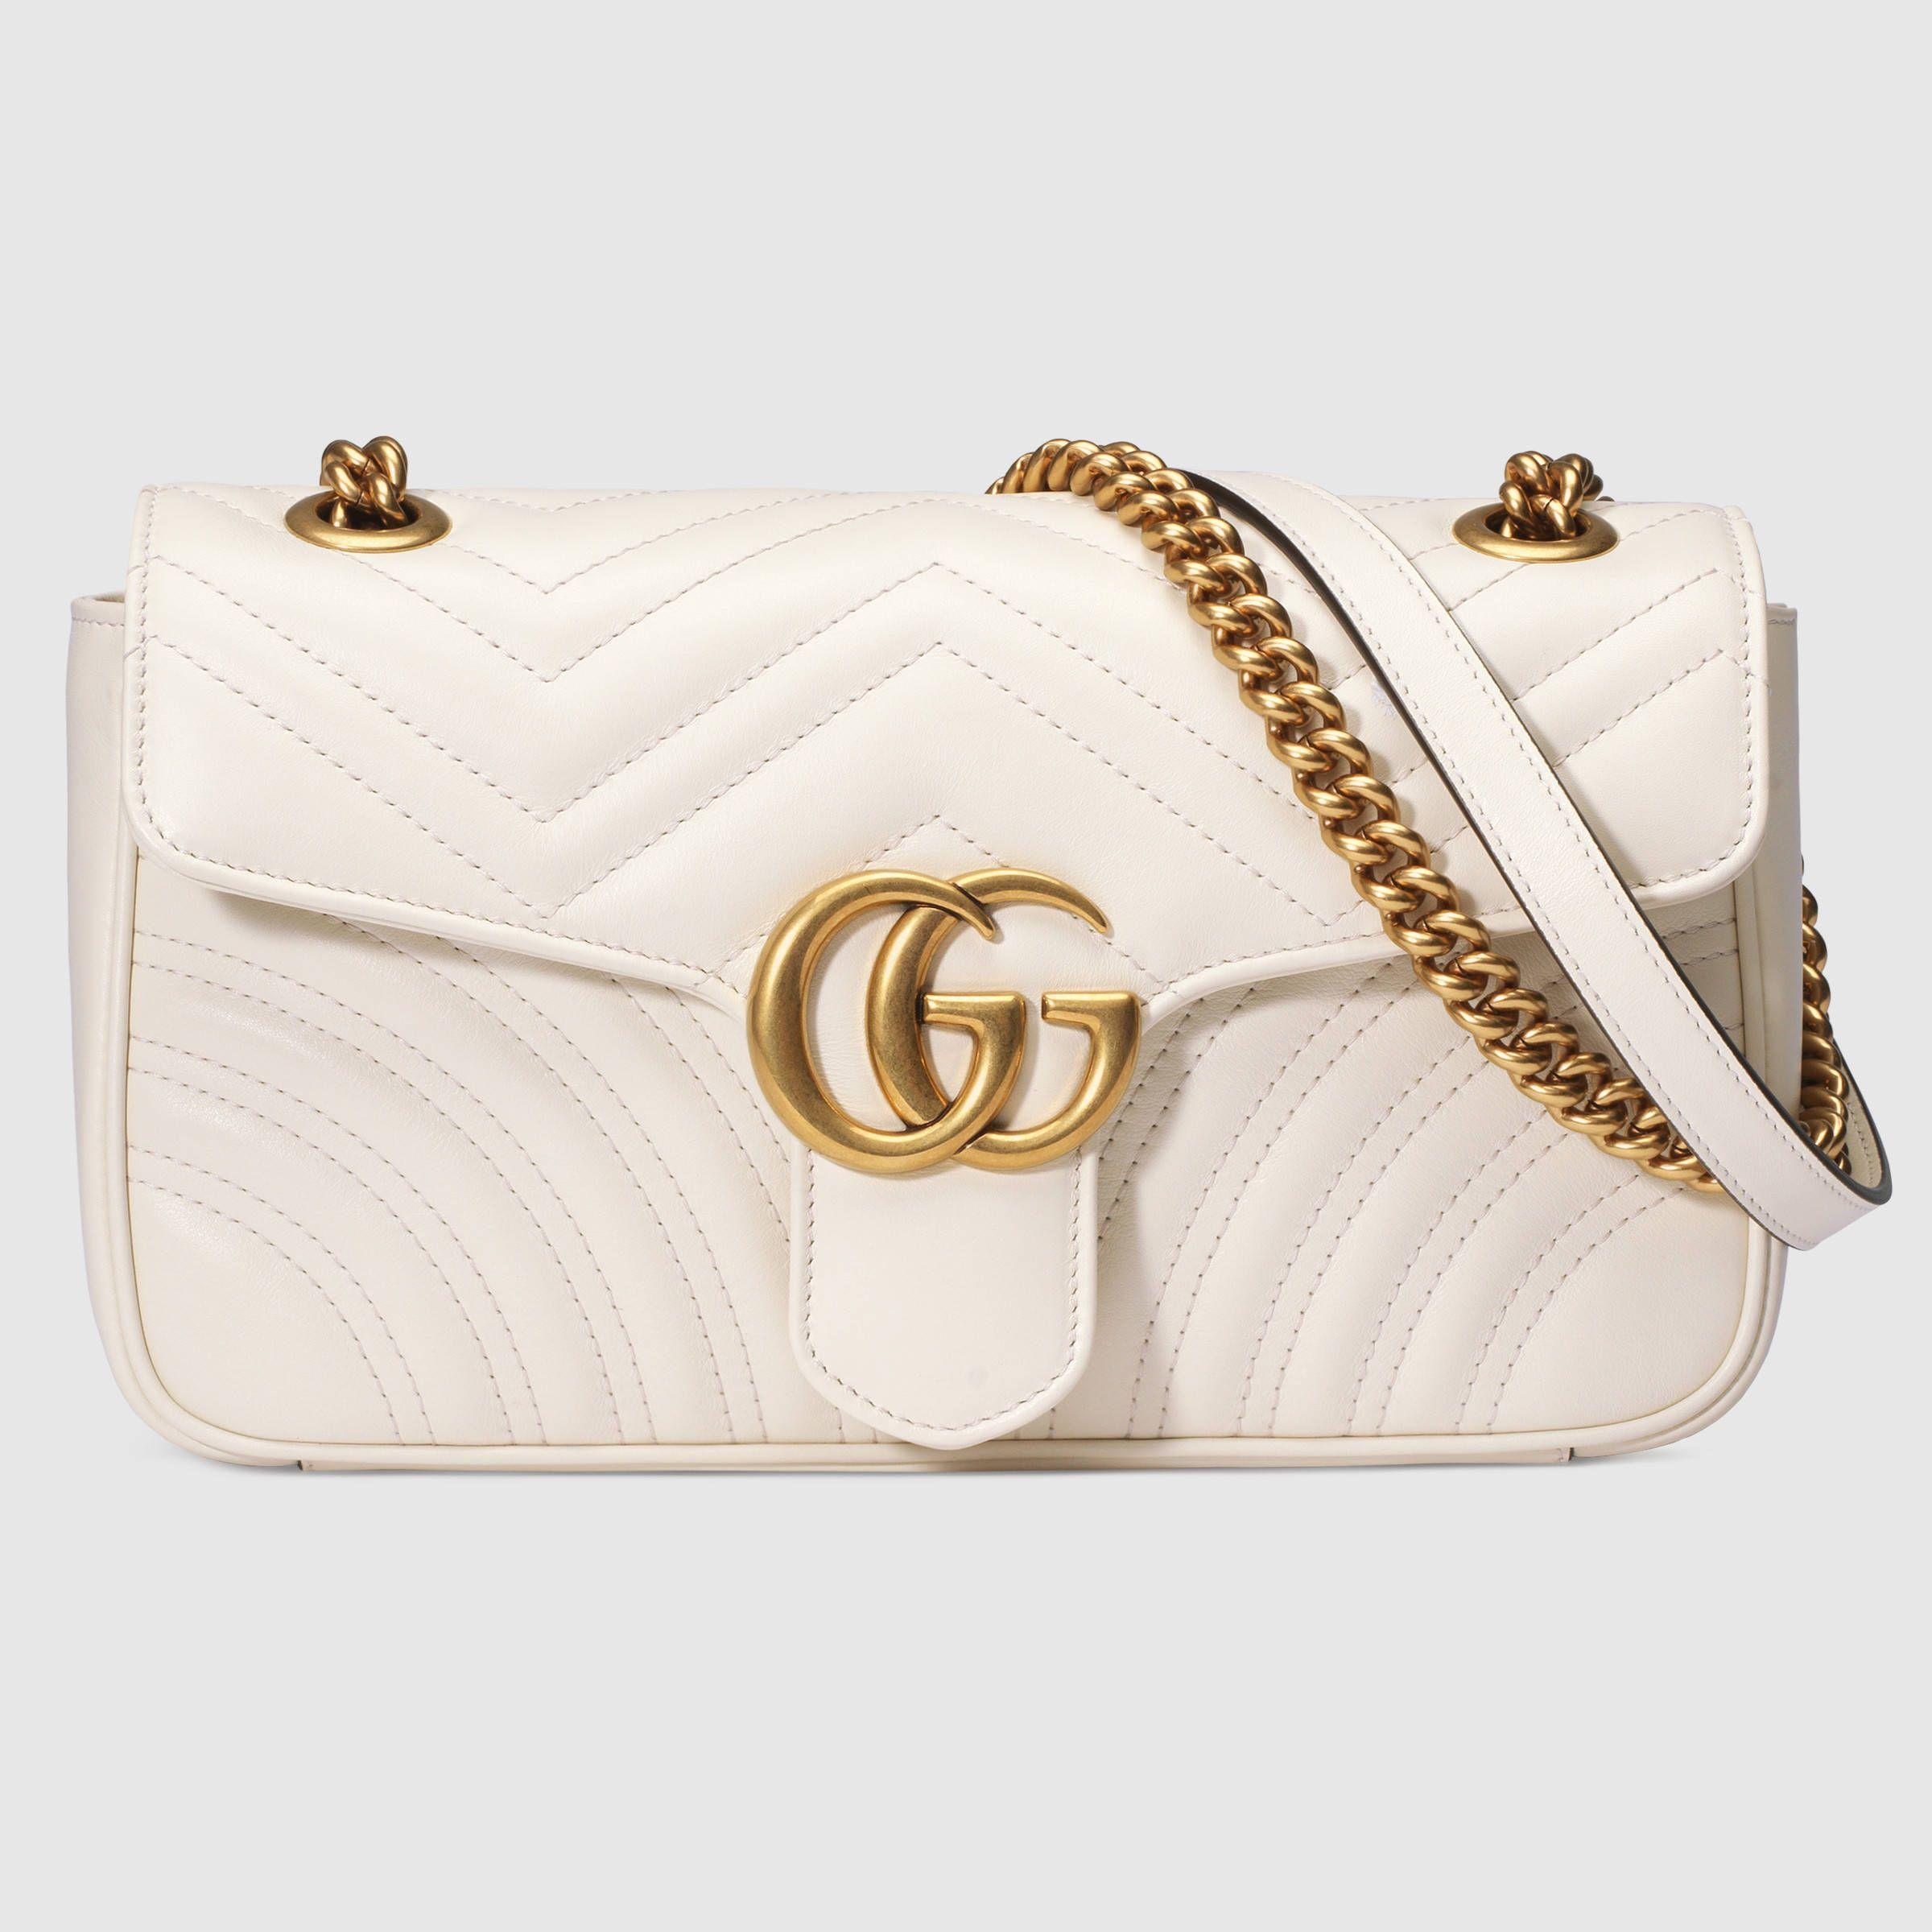 f309e09f60c4 GG Marmont matelassé shoulder bag - Gucci Women s Shoulder Bags  443497DRW3T9022